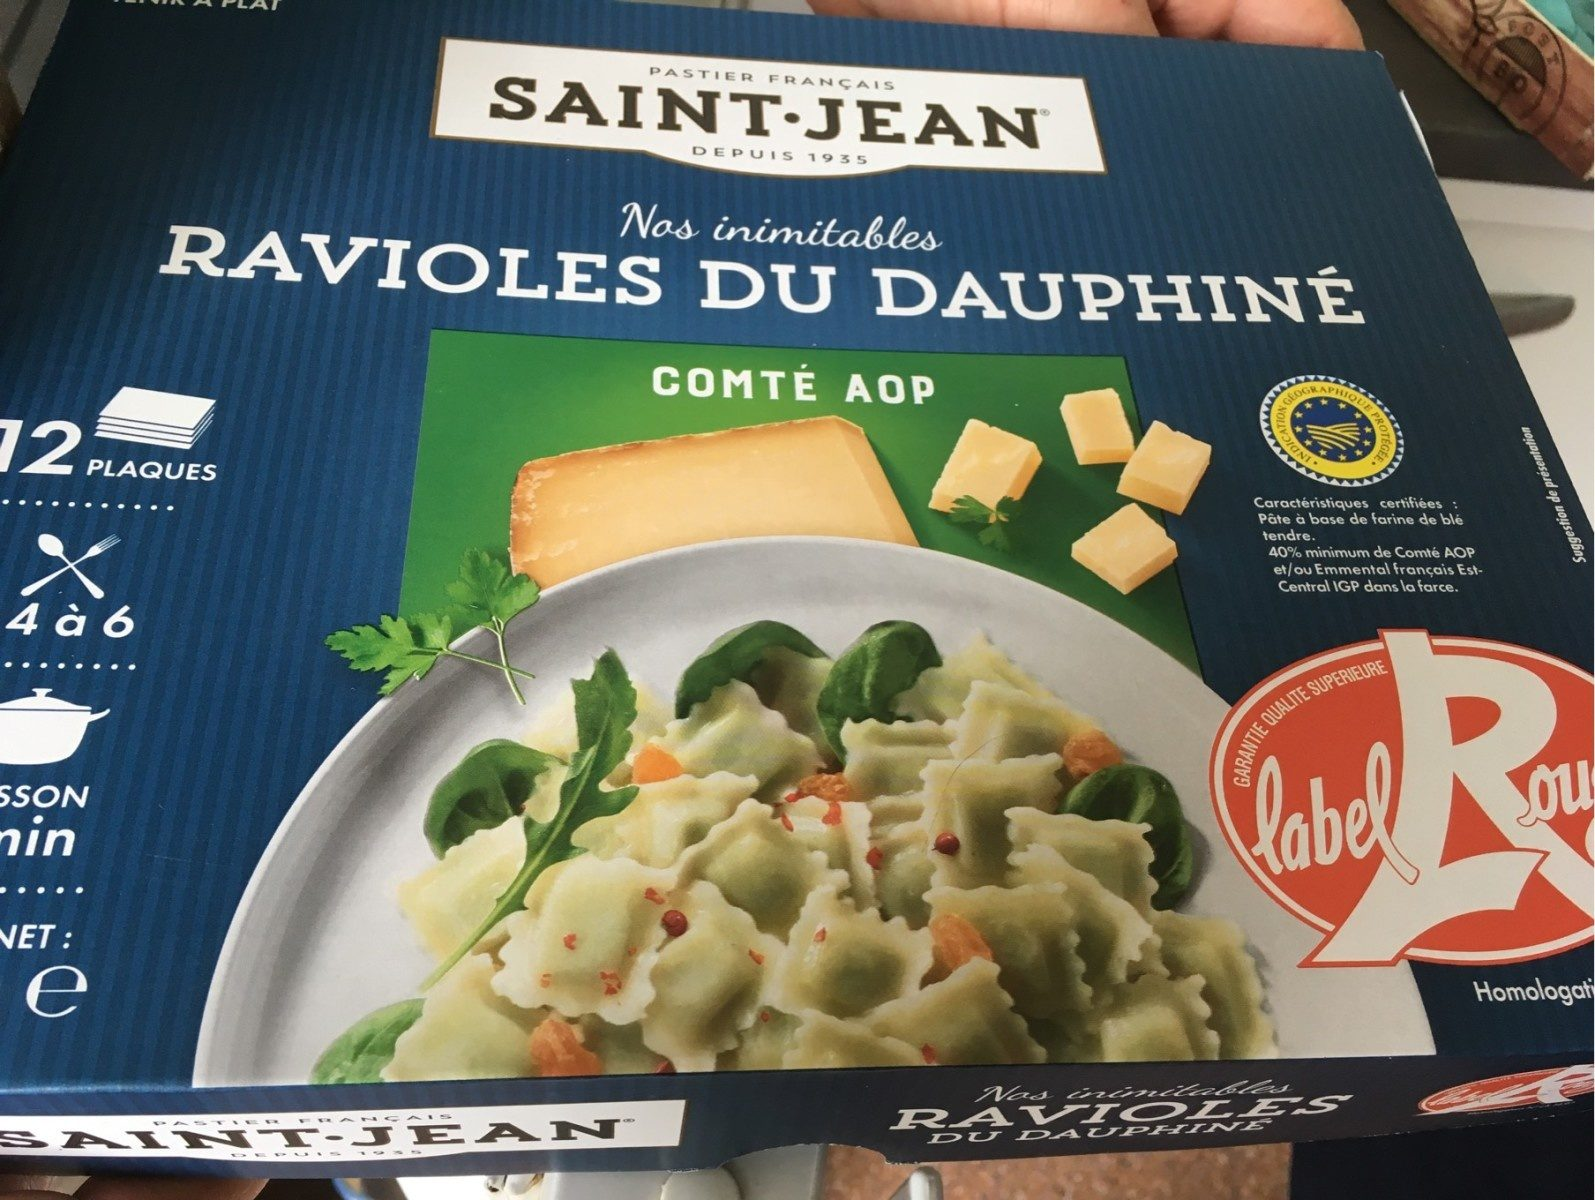 Ravioles du dauphine - Produit